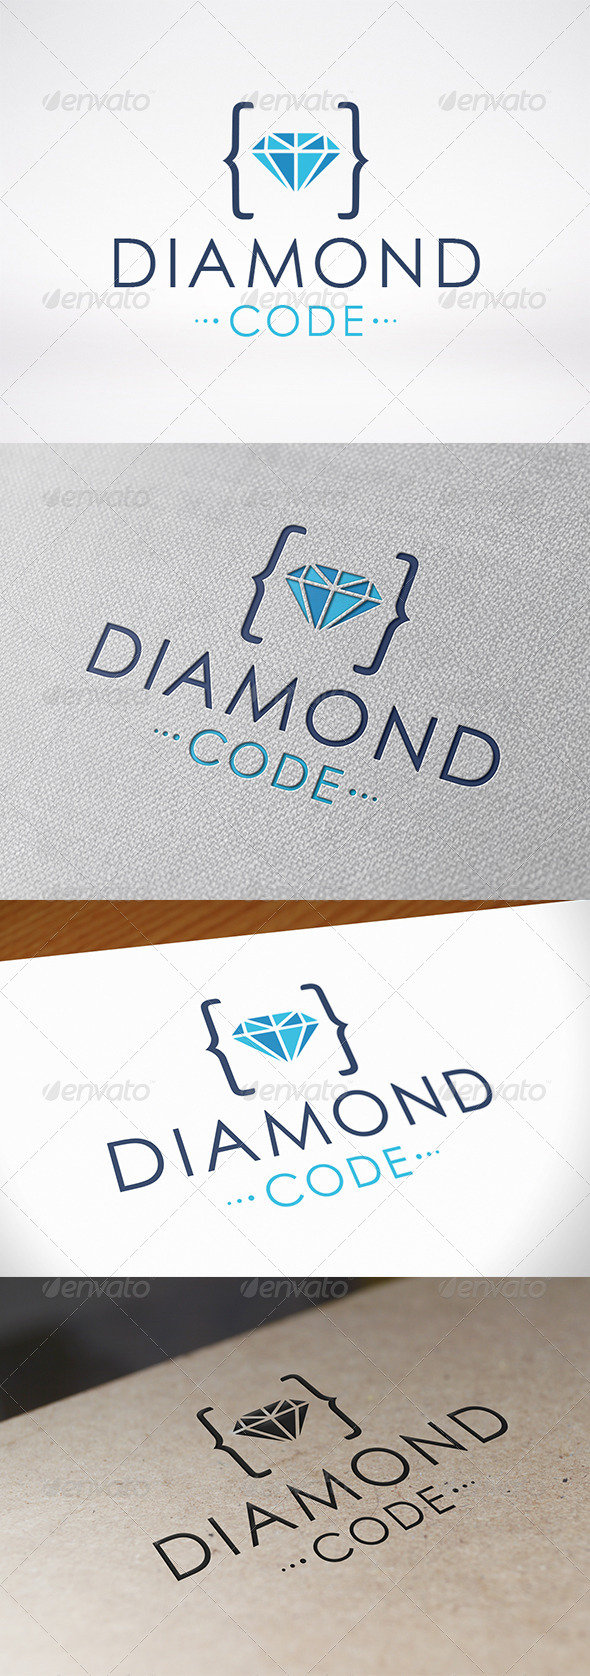 Code Diamond Logo Template - Symbols Logo Templates